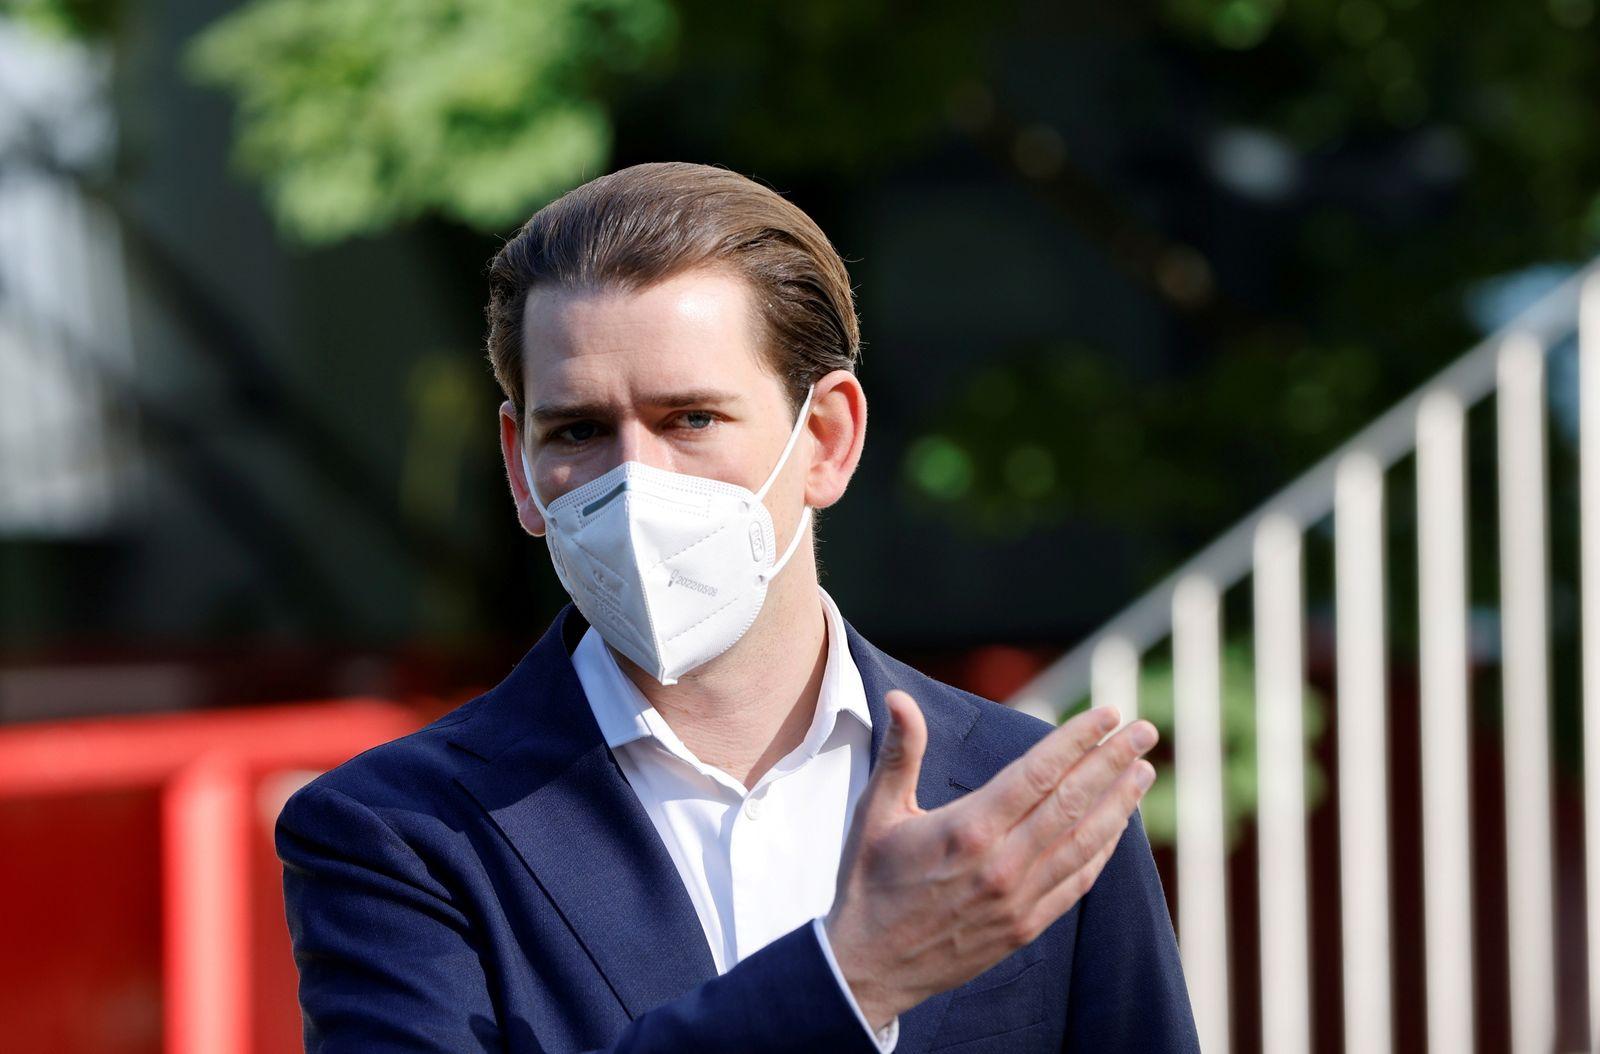 FILE PHOTO: Austria's Chancellor Kurz visits a public school in Vienna